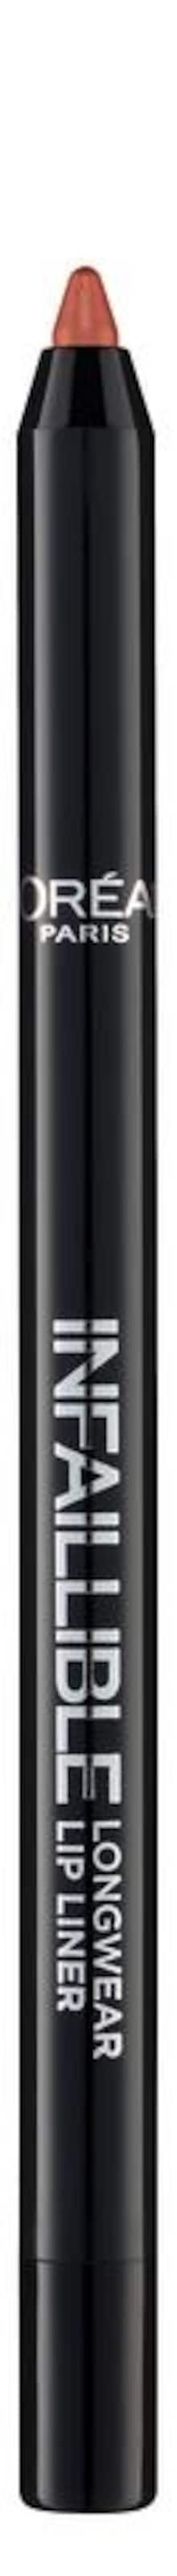 Rabatt Echt Freies Verschiffen Extrem L'Oréal Paris 'Infaillable Longwear Lipliner' Lippenstift eHGlwczzO